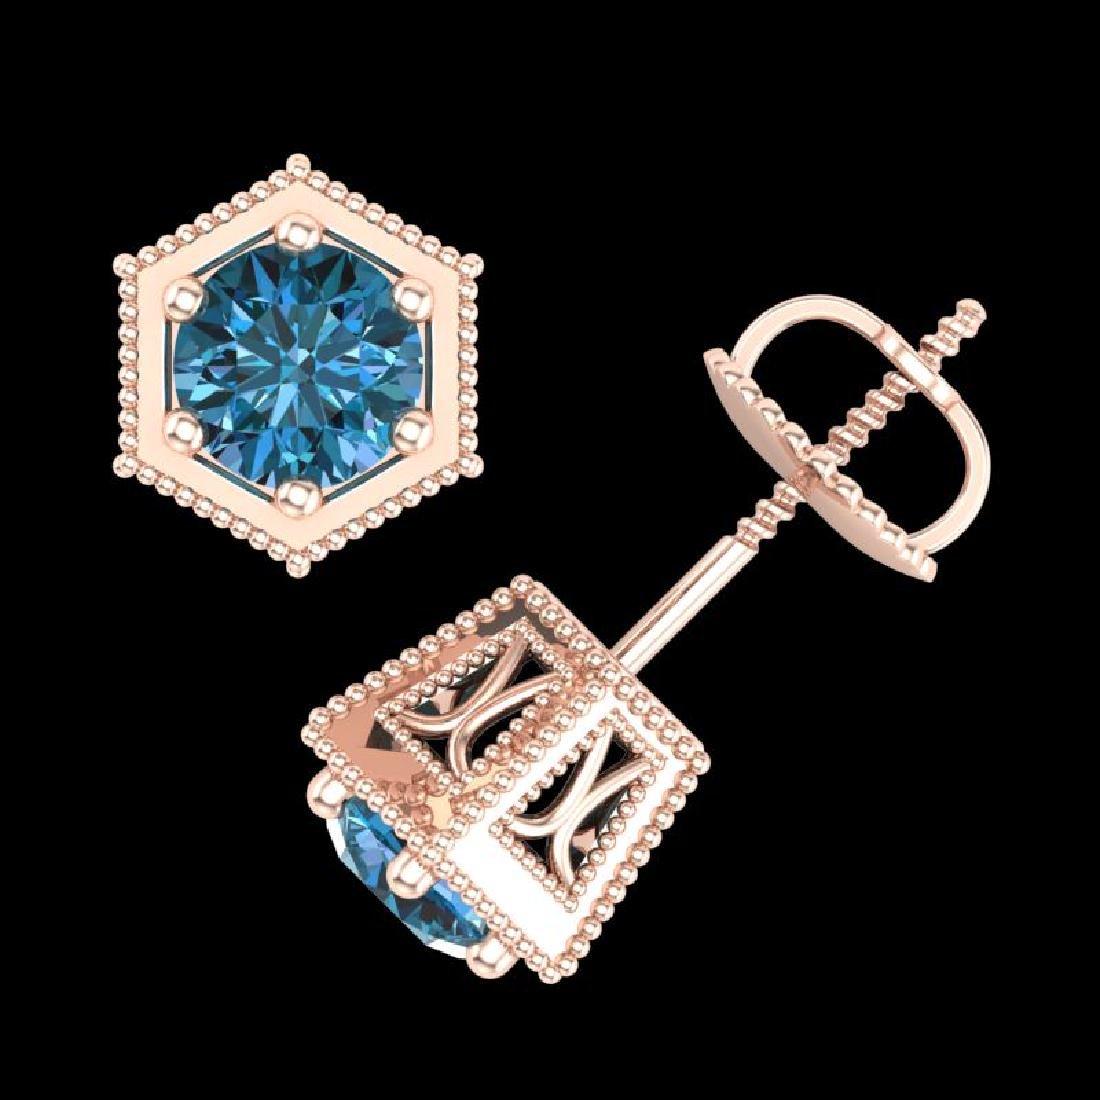 1.15 CTW Fancy Intense Blue Diamond Art Deco Stud - 3